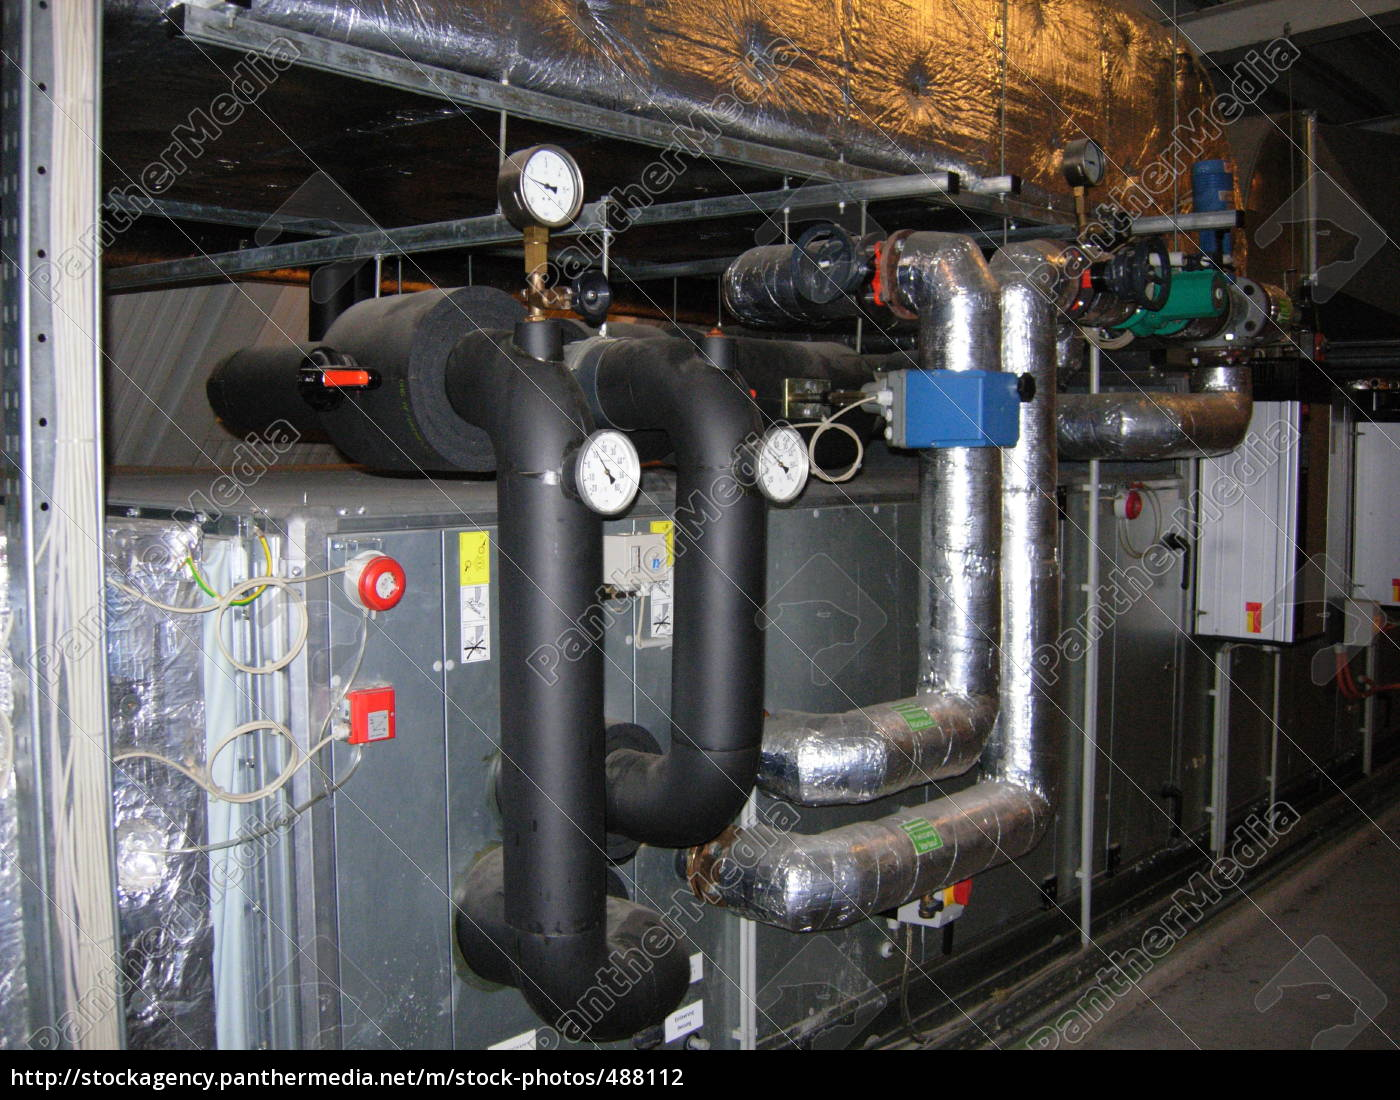 ventilation - 488112